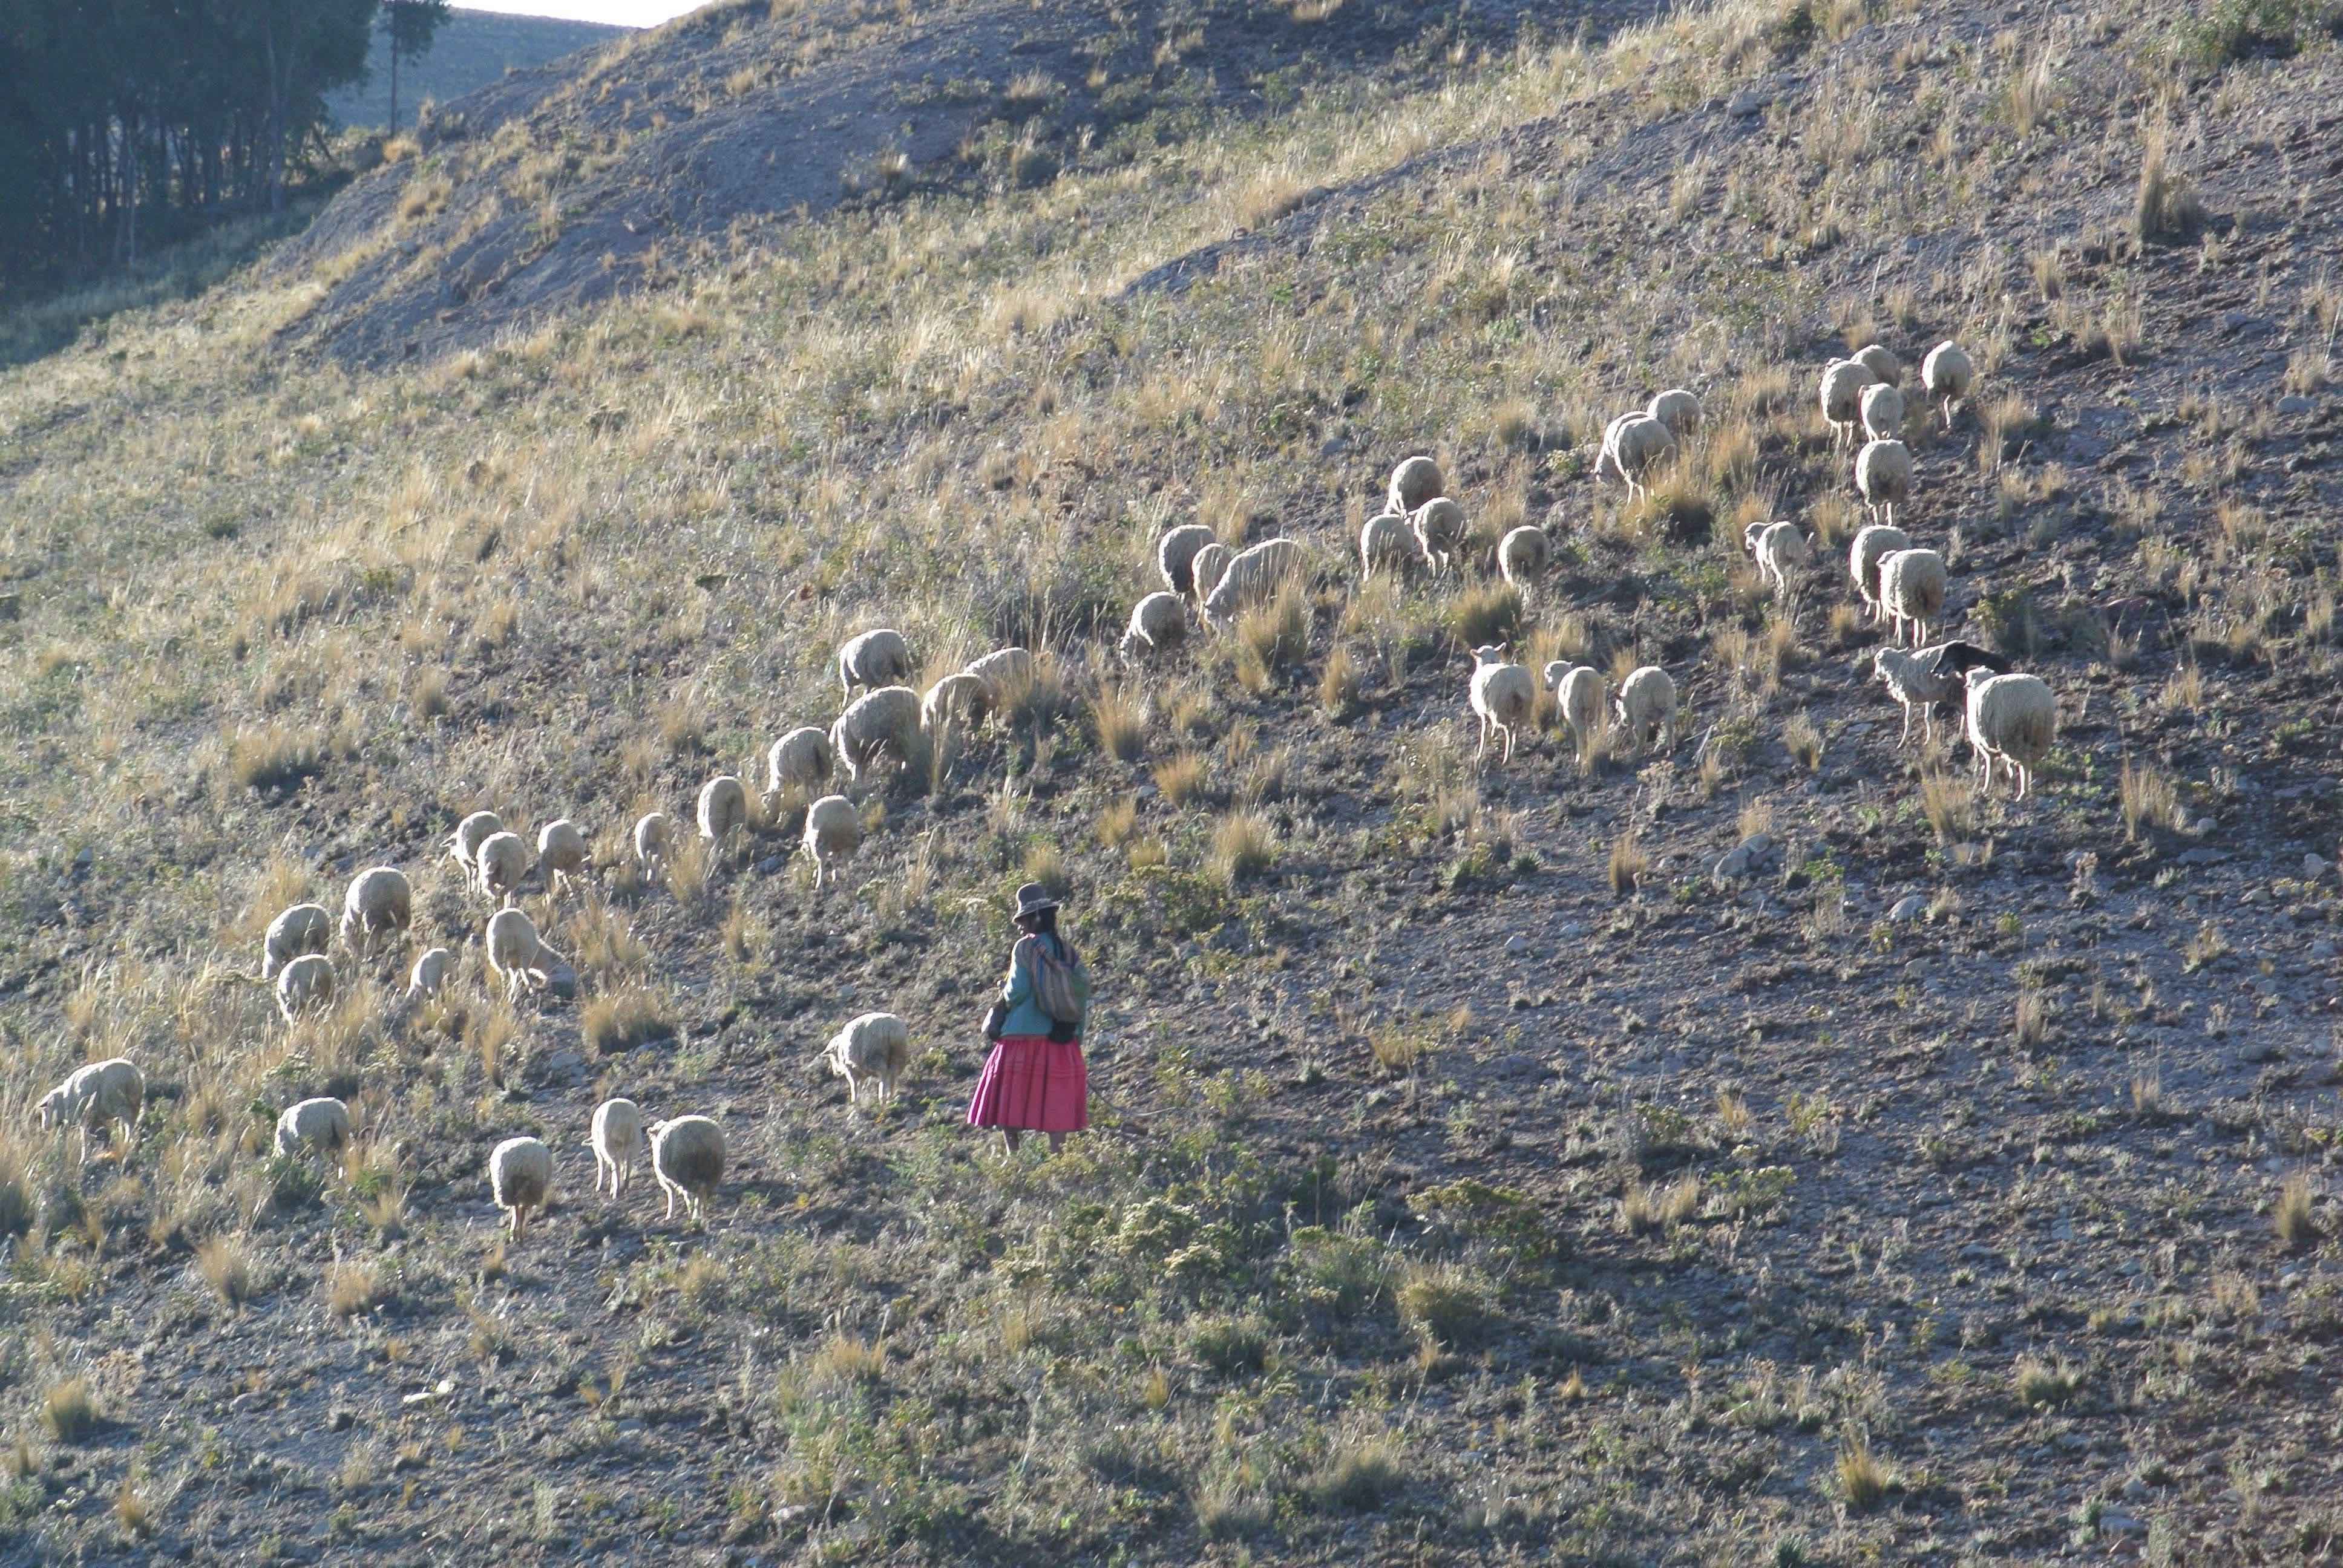 005 2111 Titicacasee 18jpeg